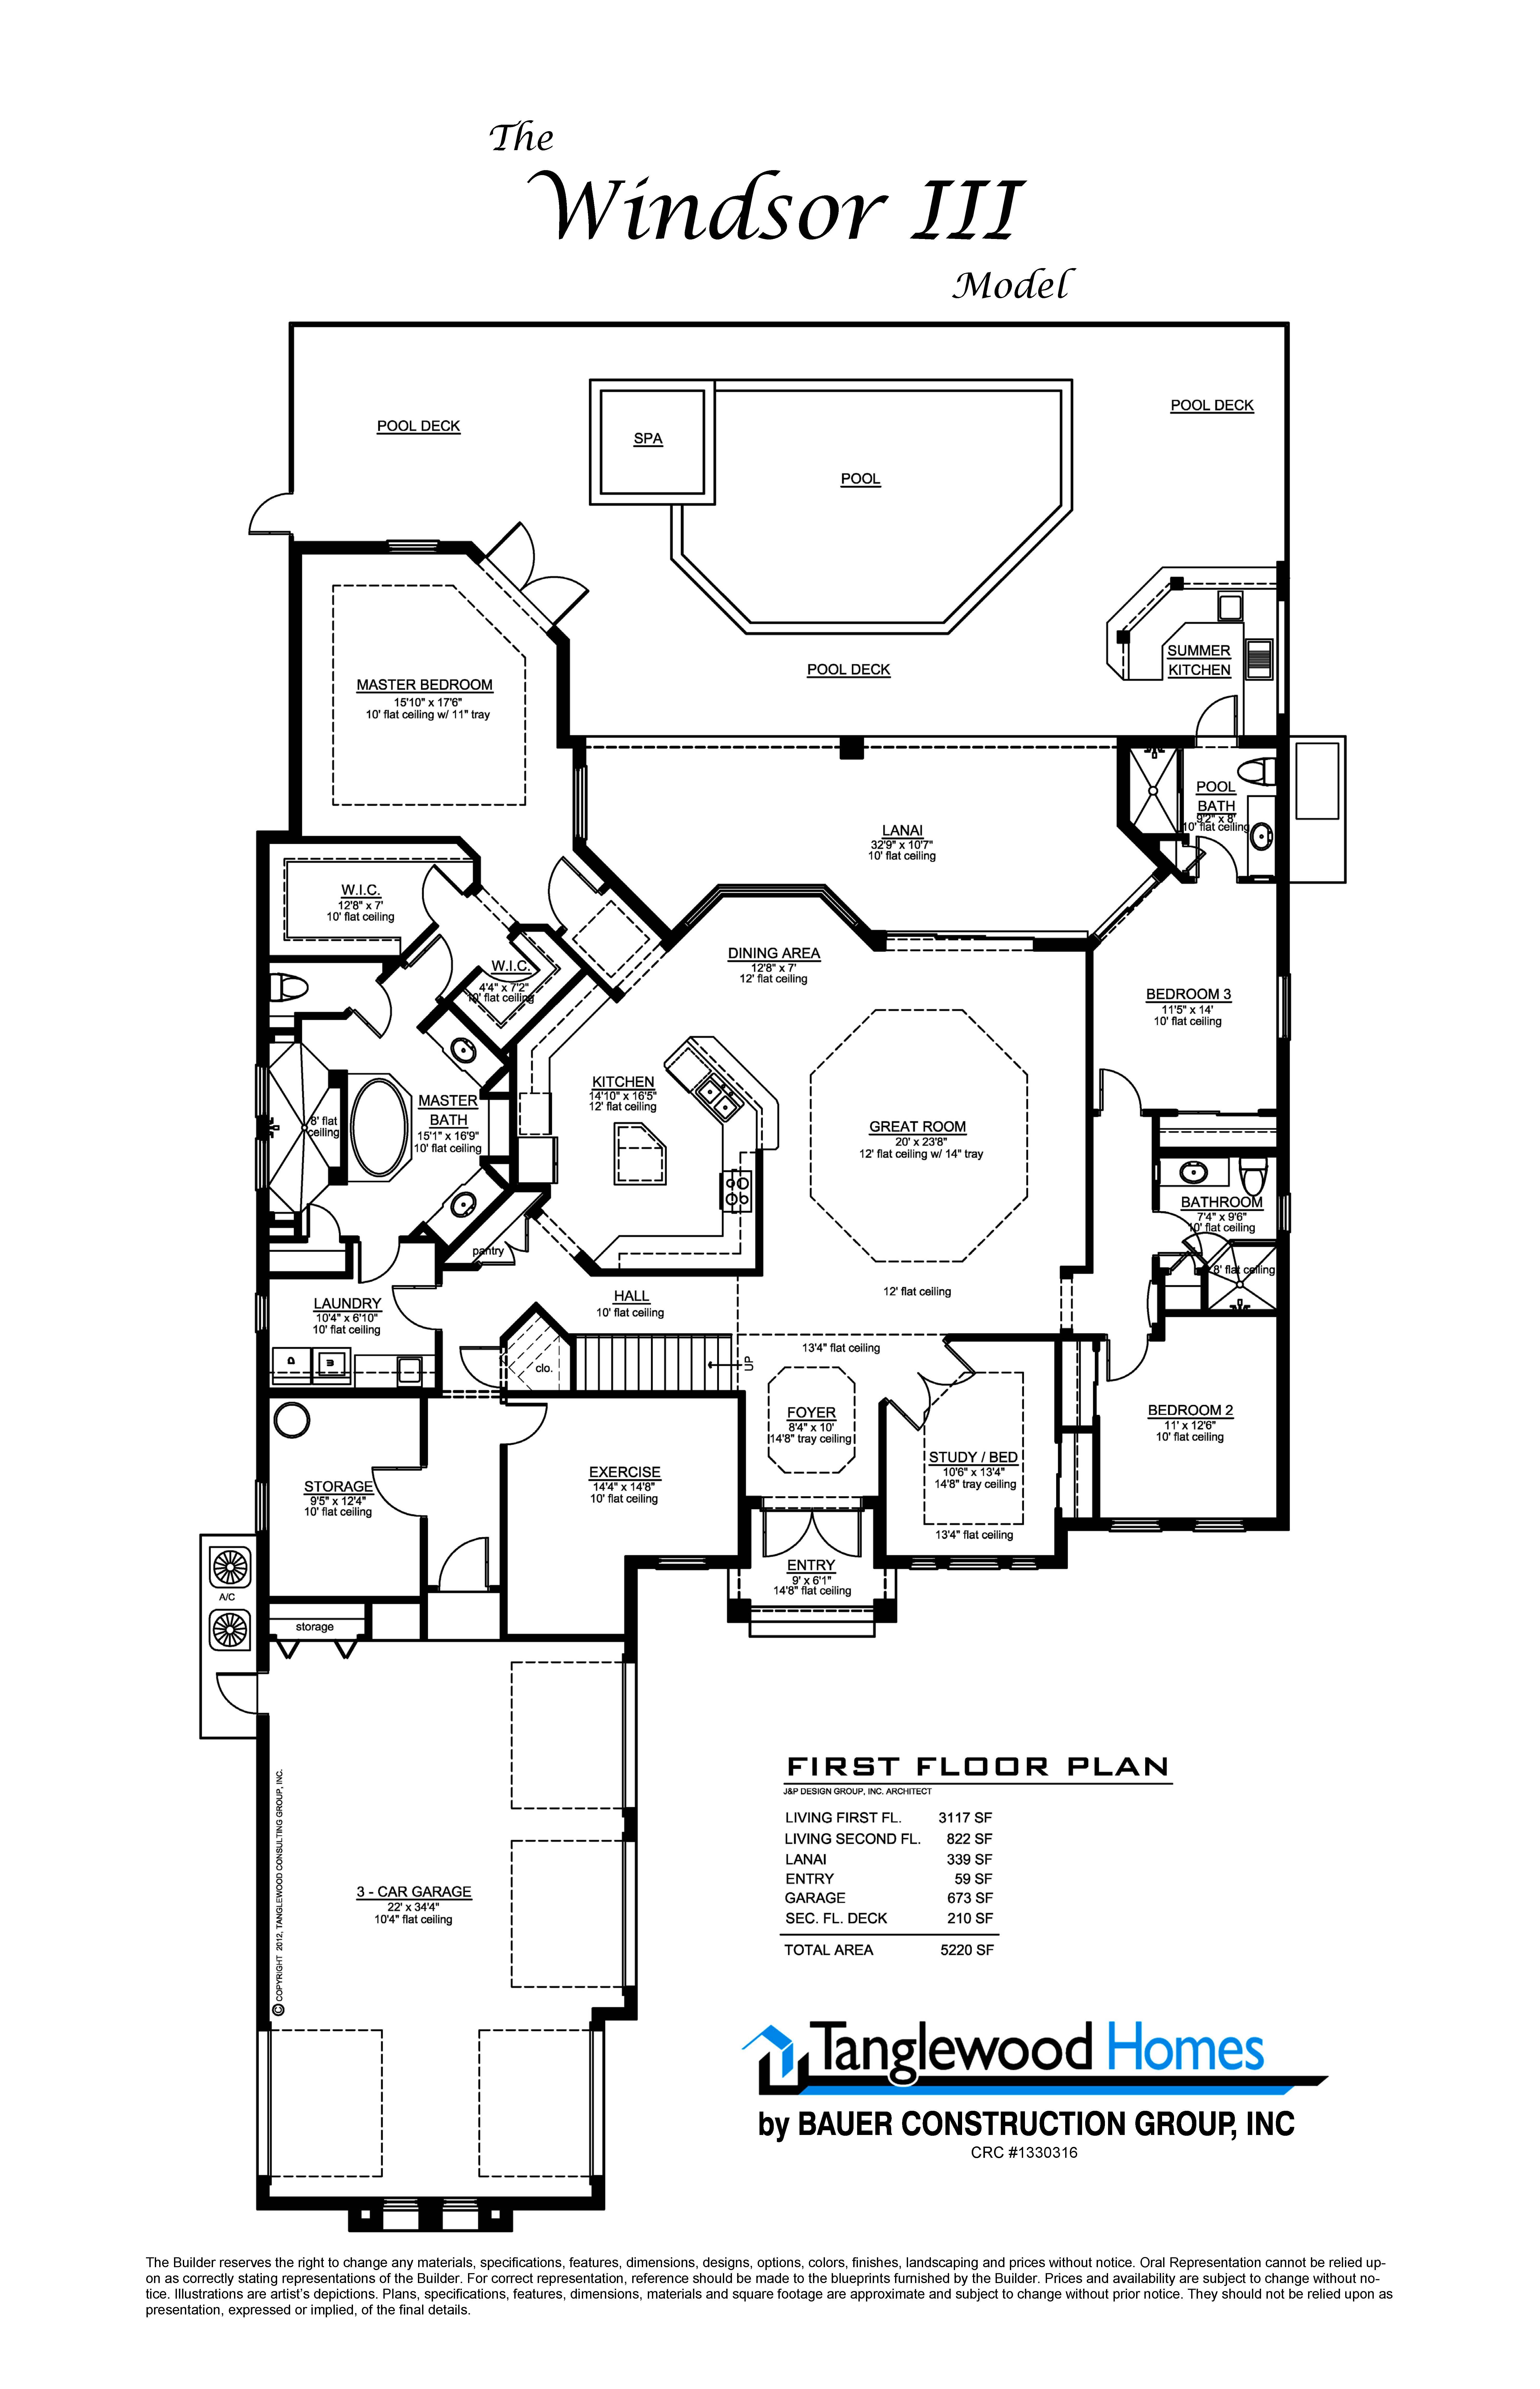 Home Construction Plans Windsor Iii Ft Myers Fl